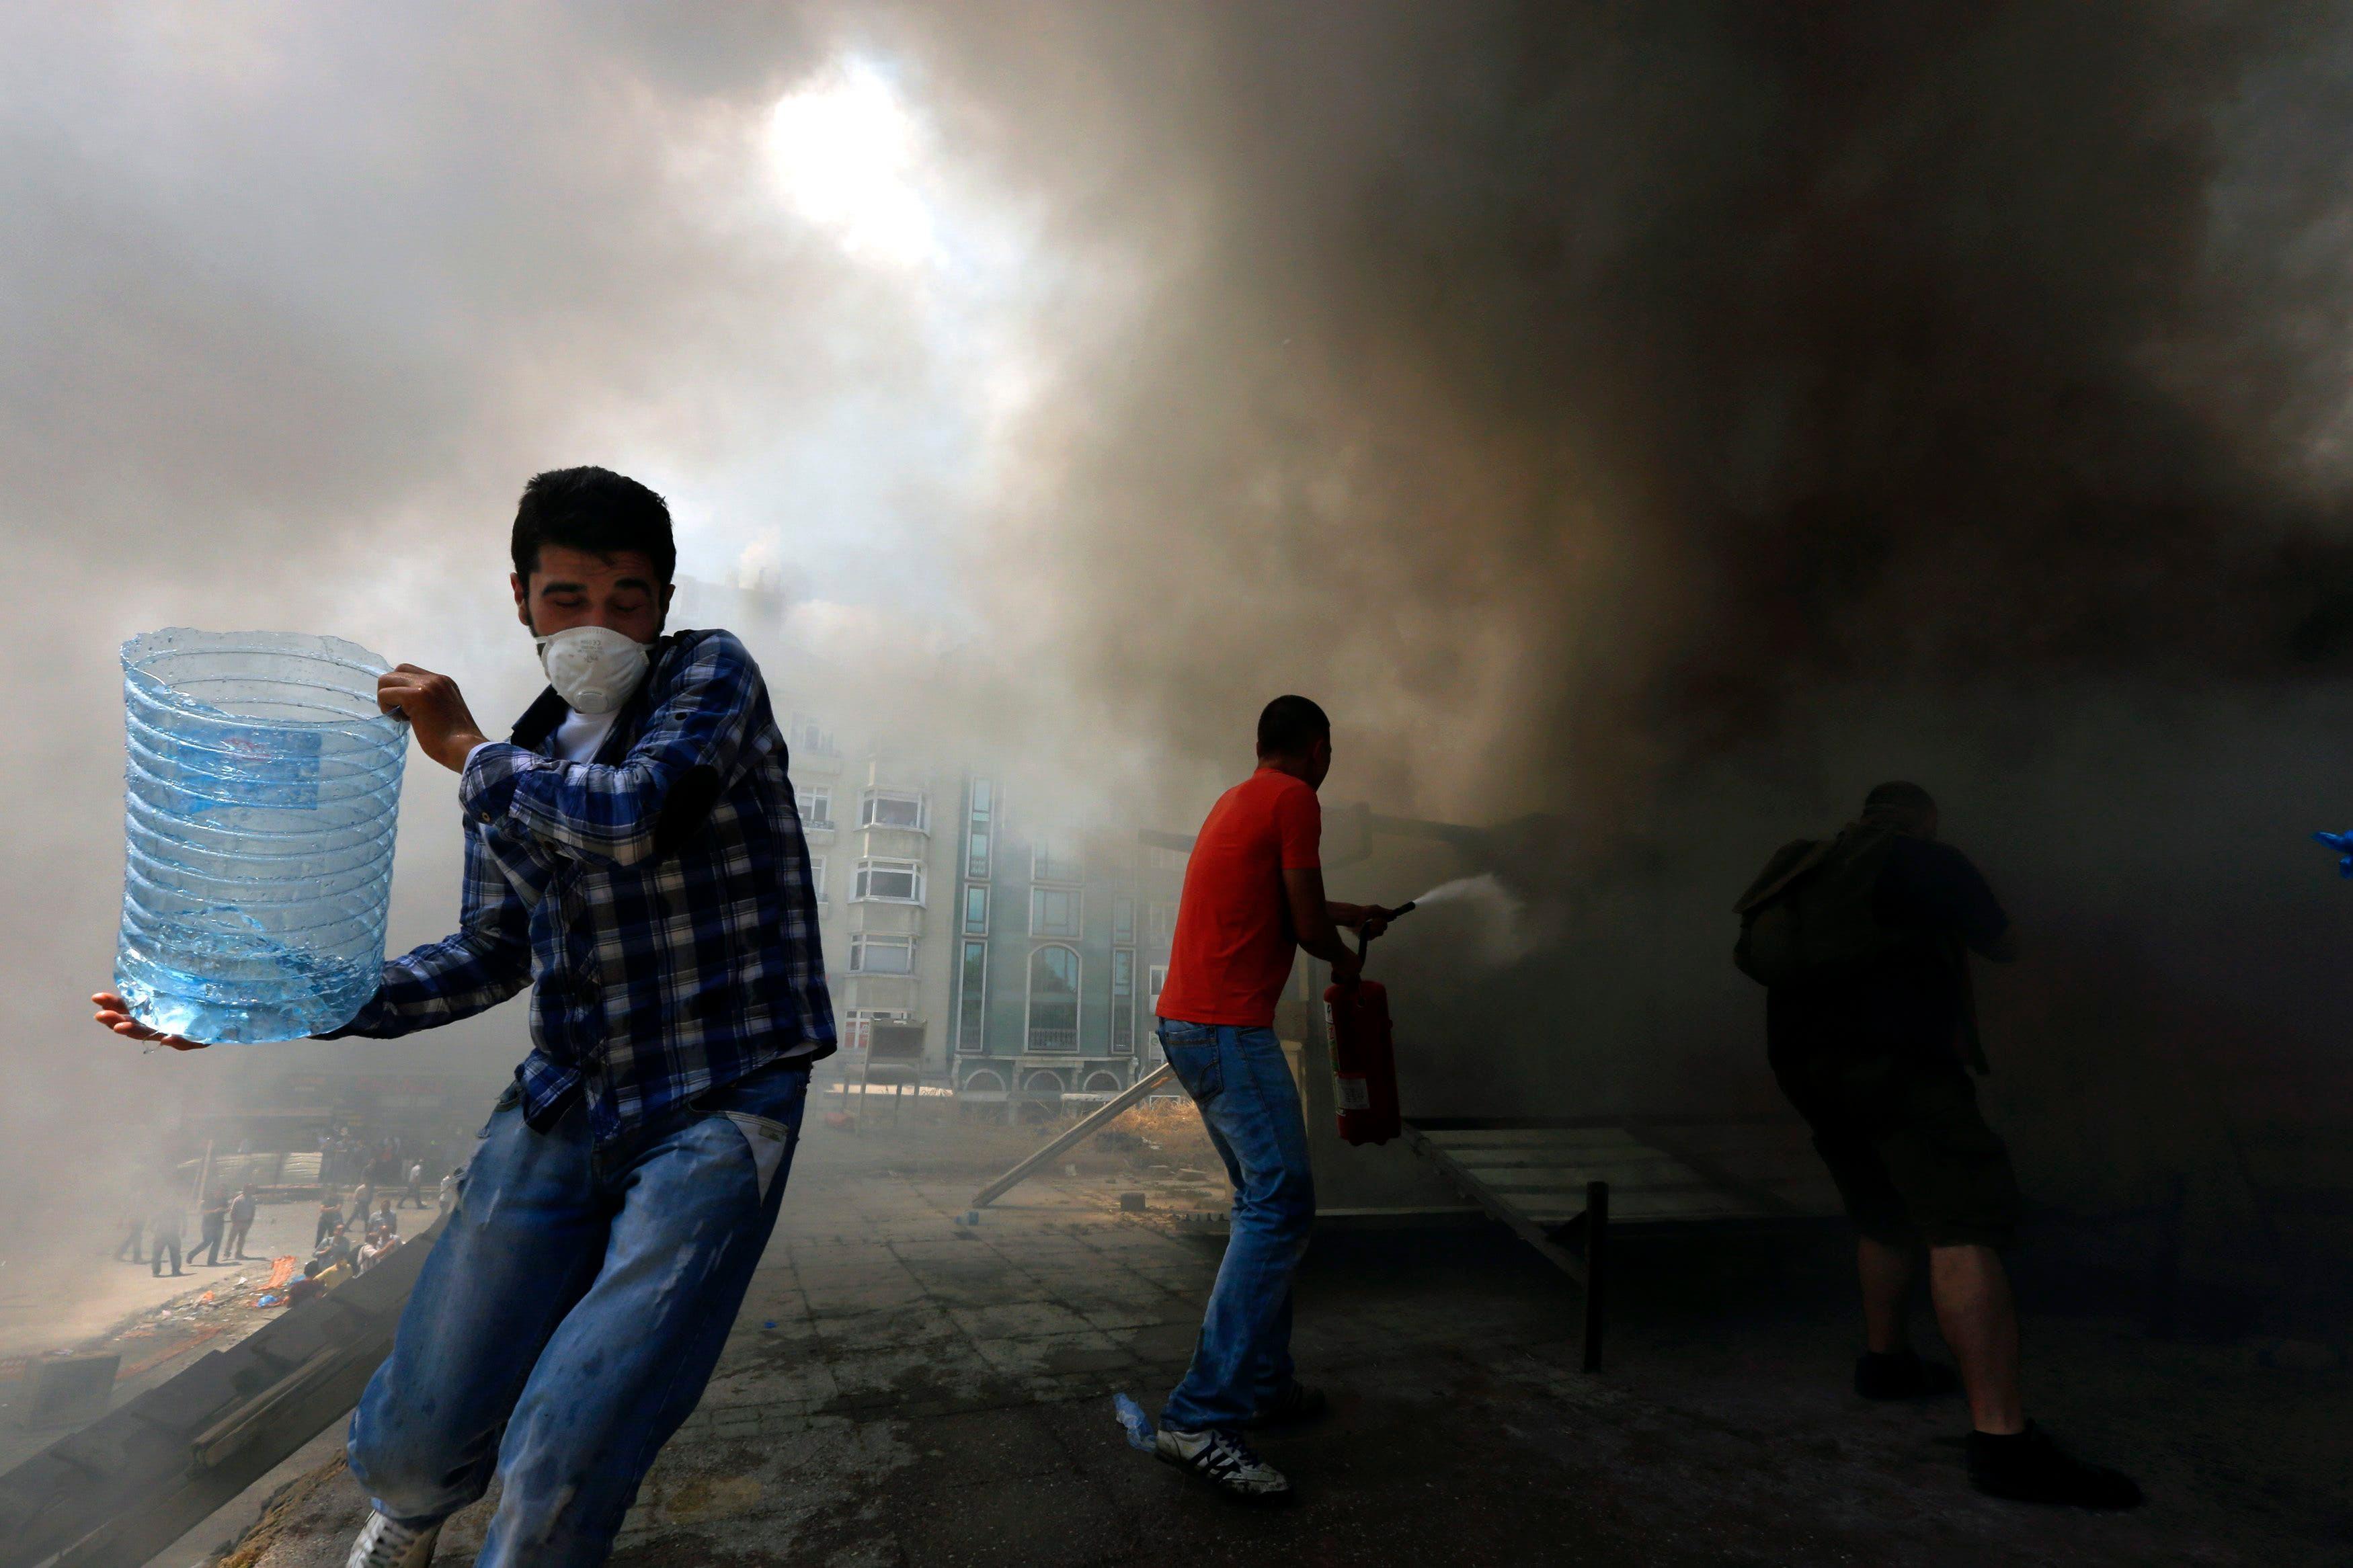 Turkey in crisis